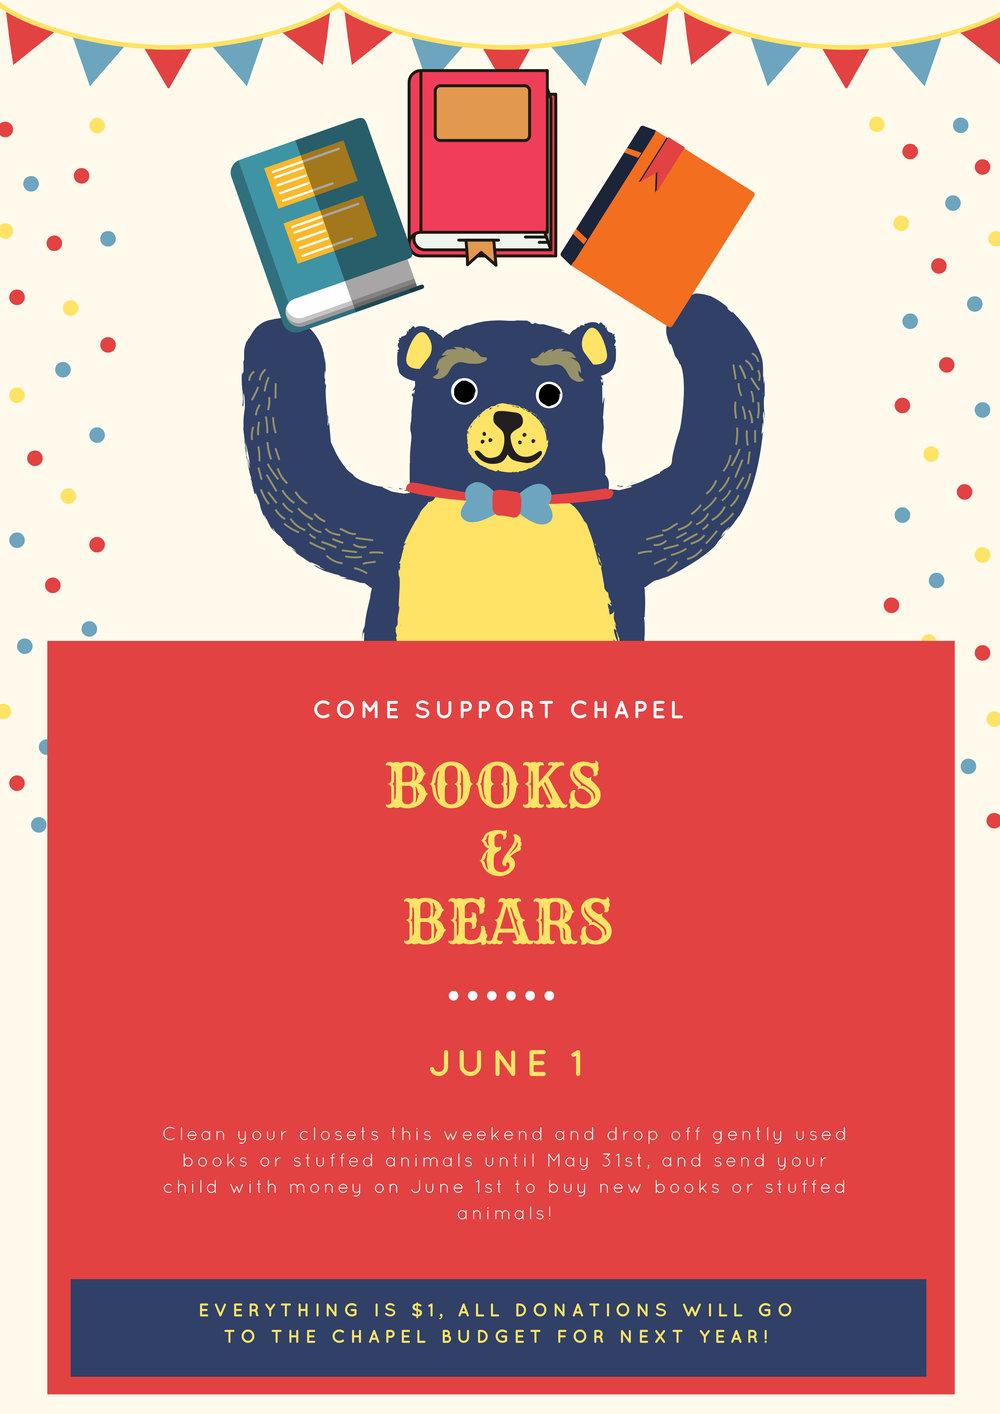 Books-and-bears-FLYER.jpg